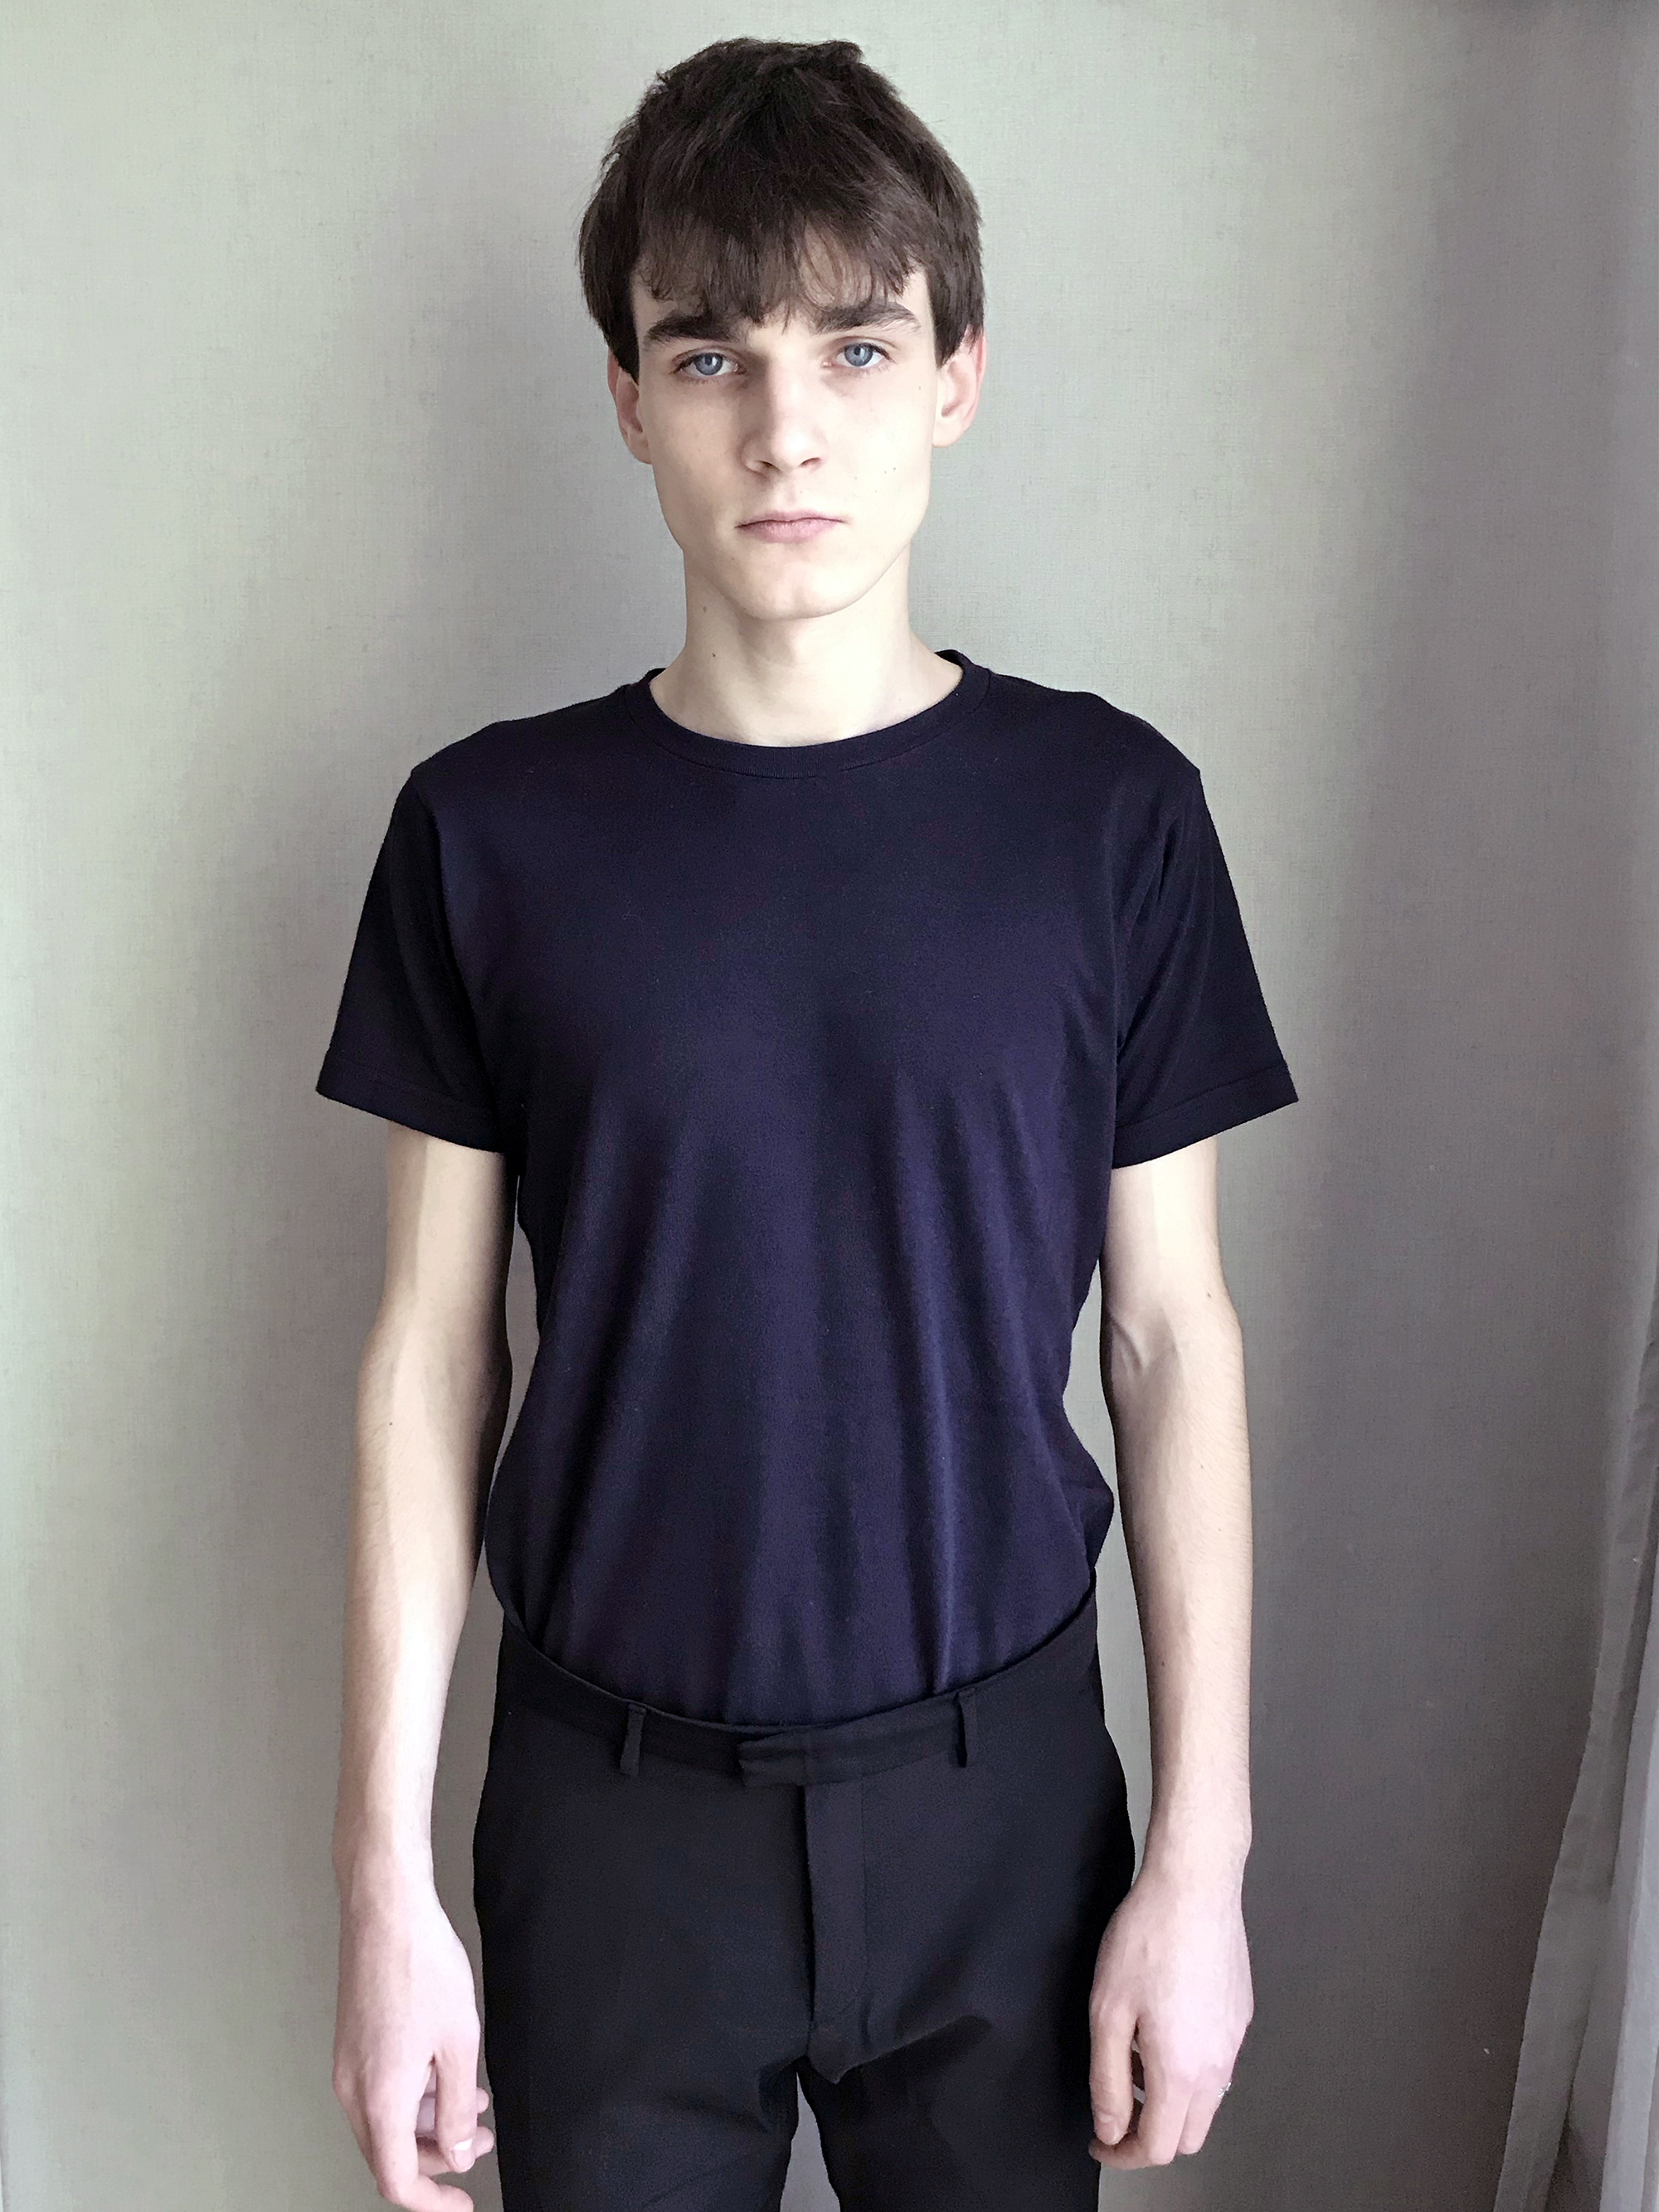 New Face Russian Male Model Kirill Kuznetsov